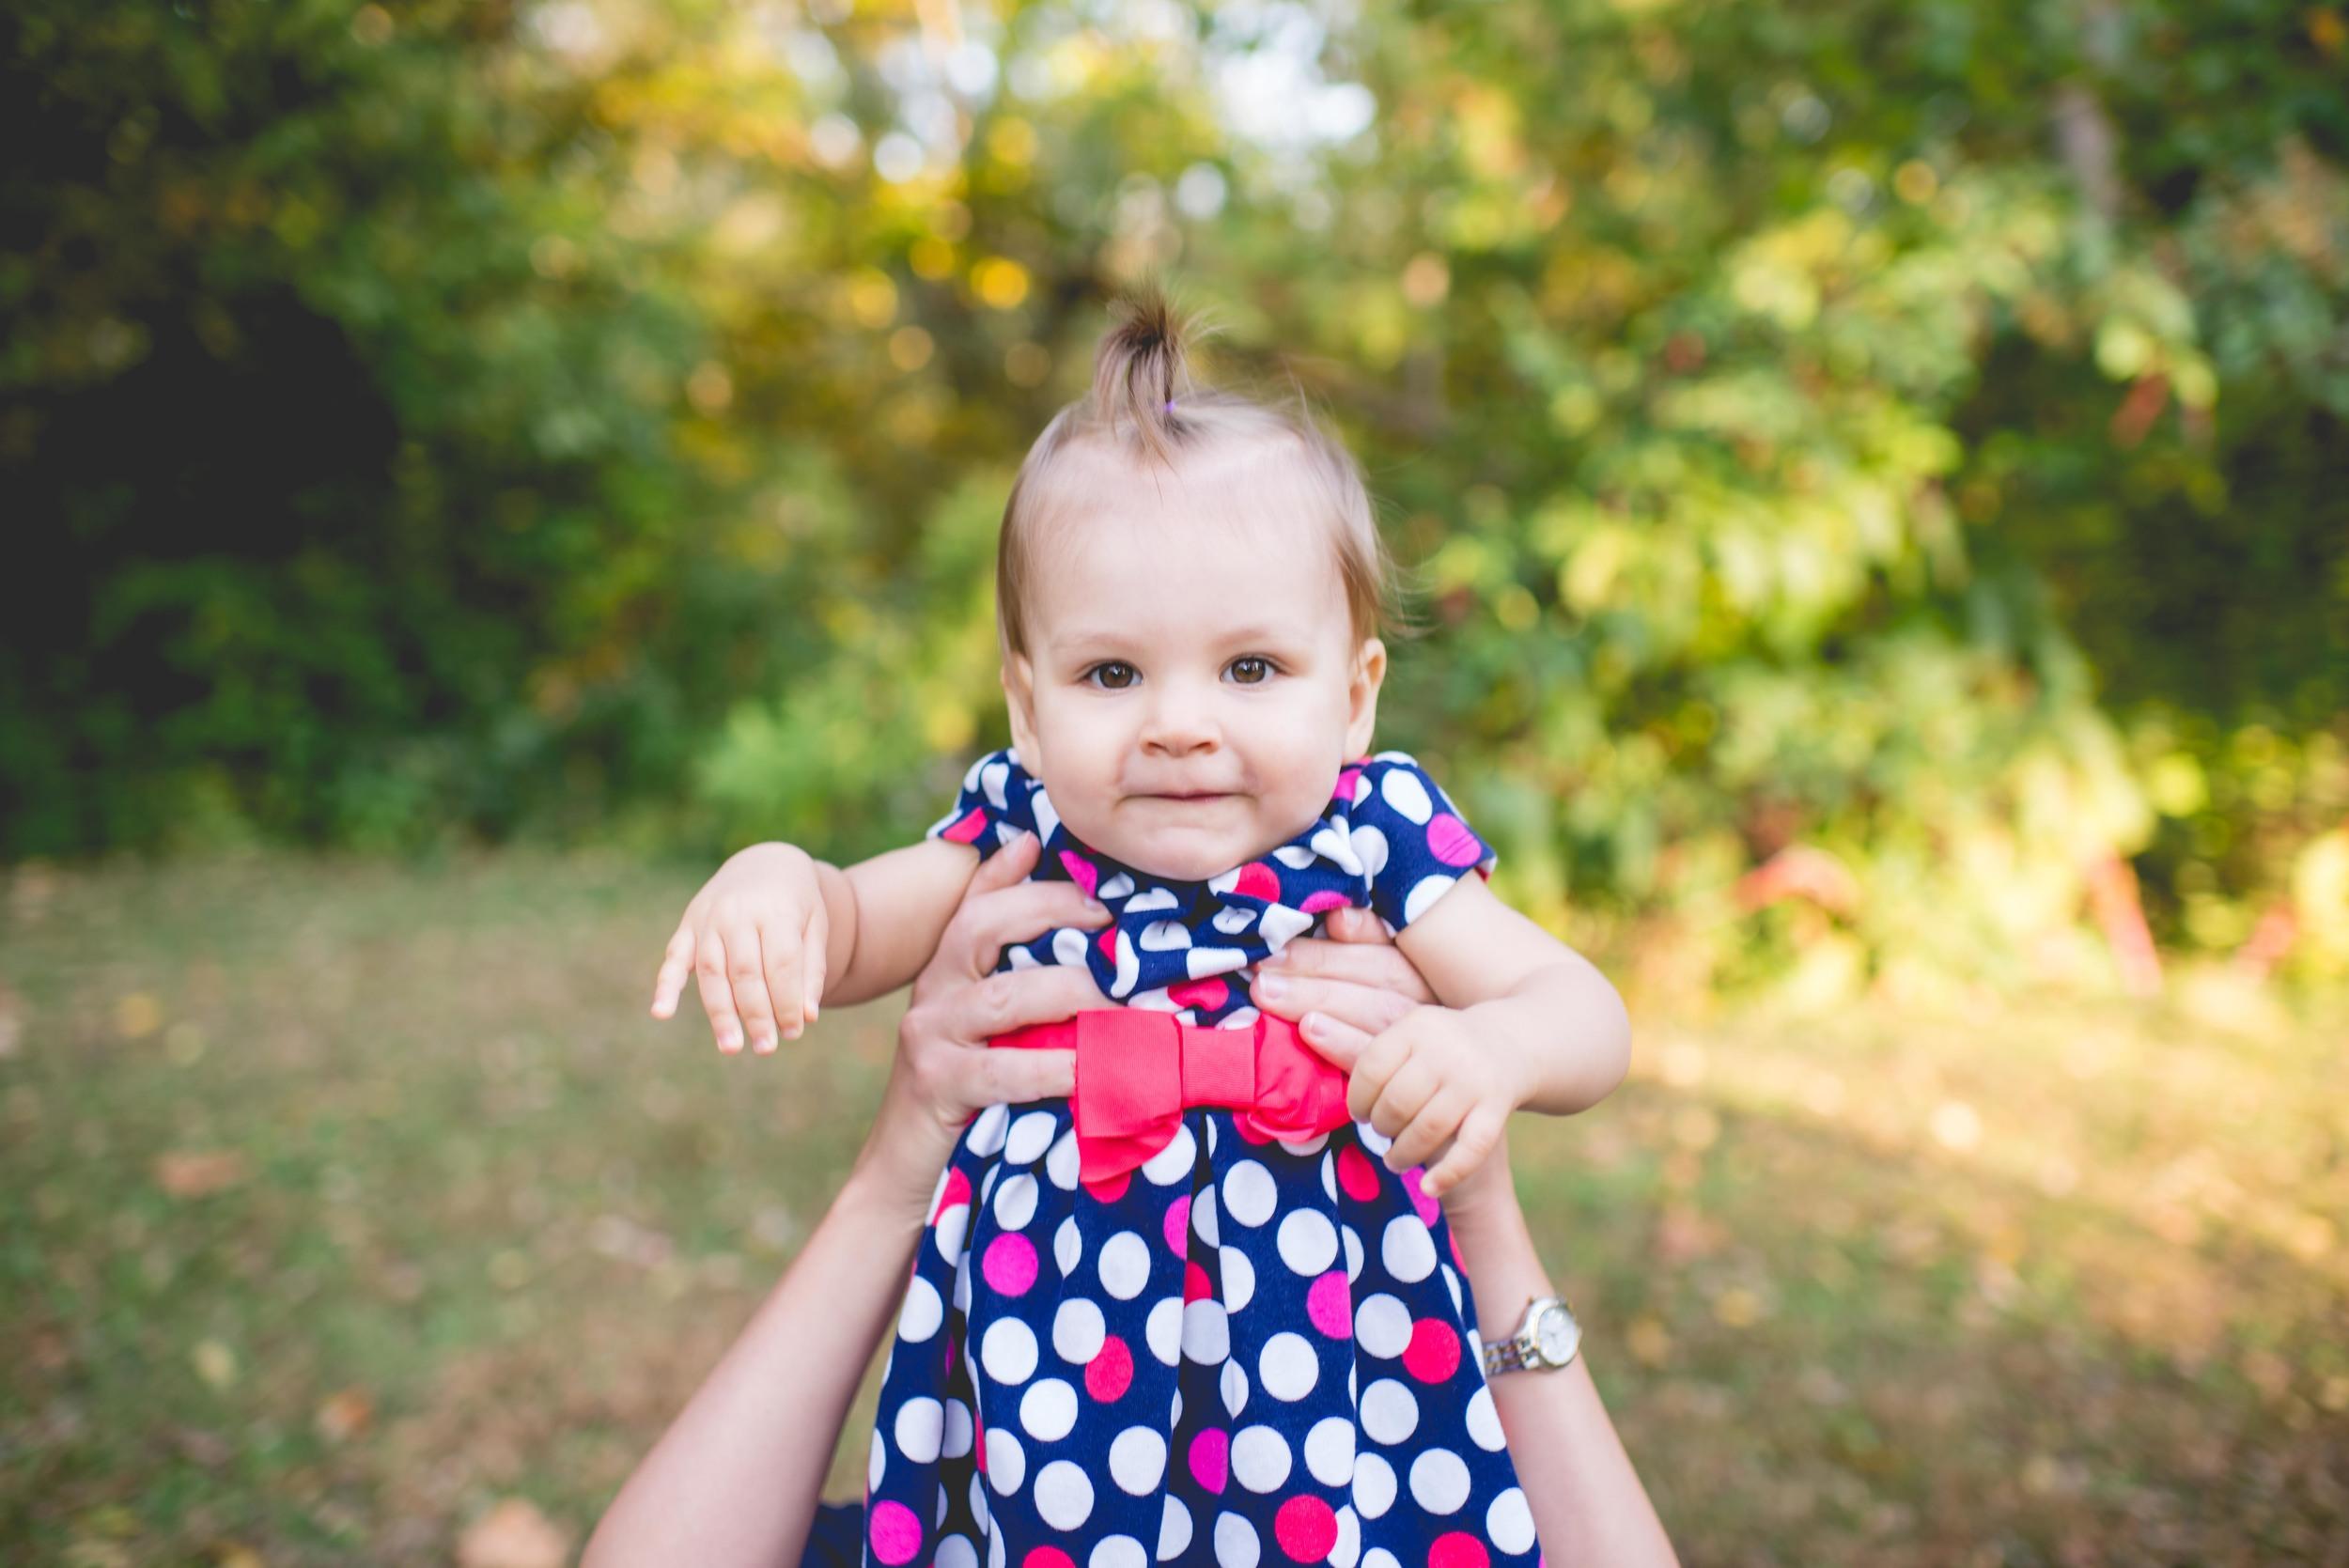 sarasutterphotography_family_MissCMaifield_2015-46.jpg